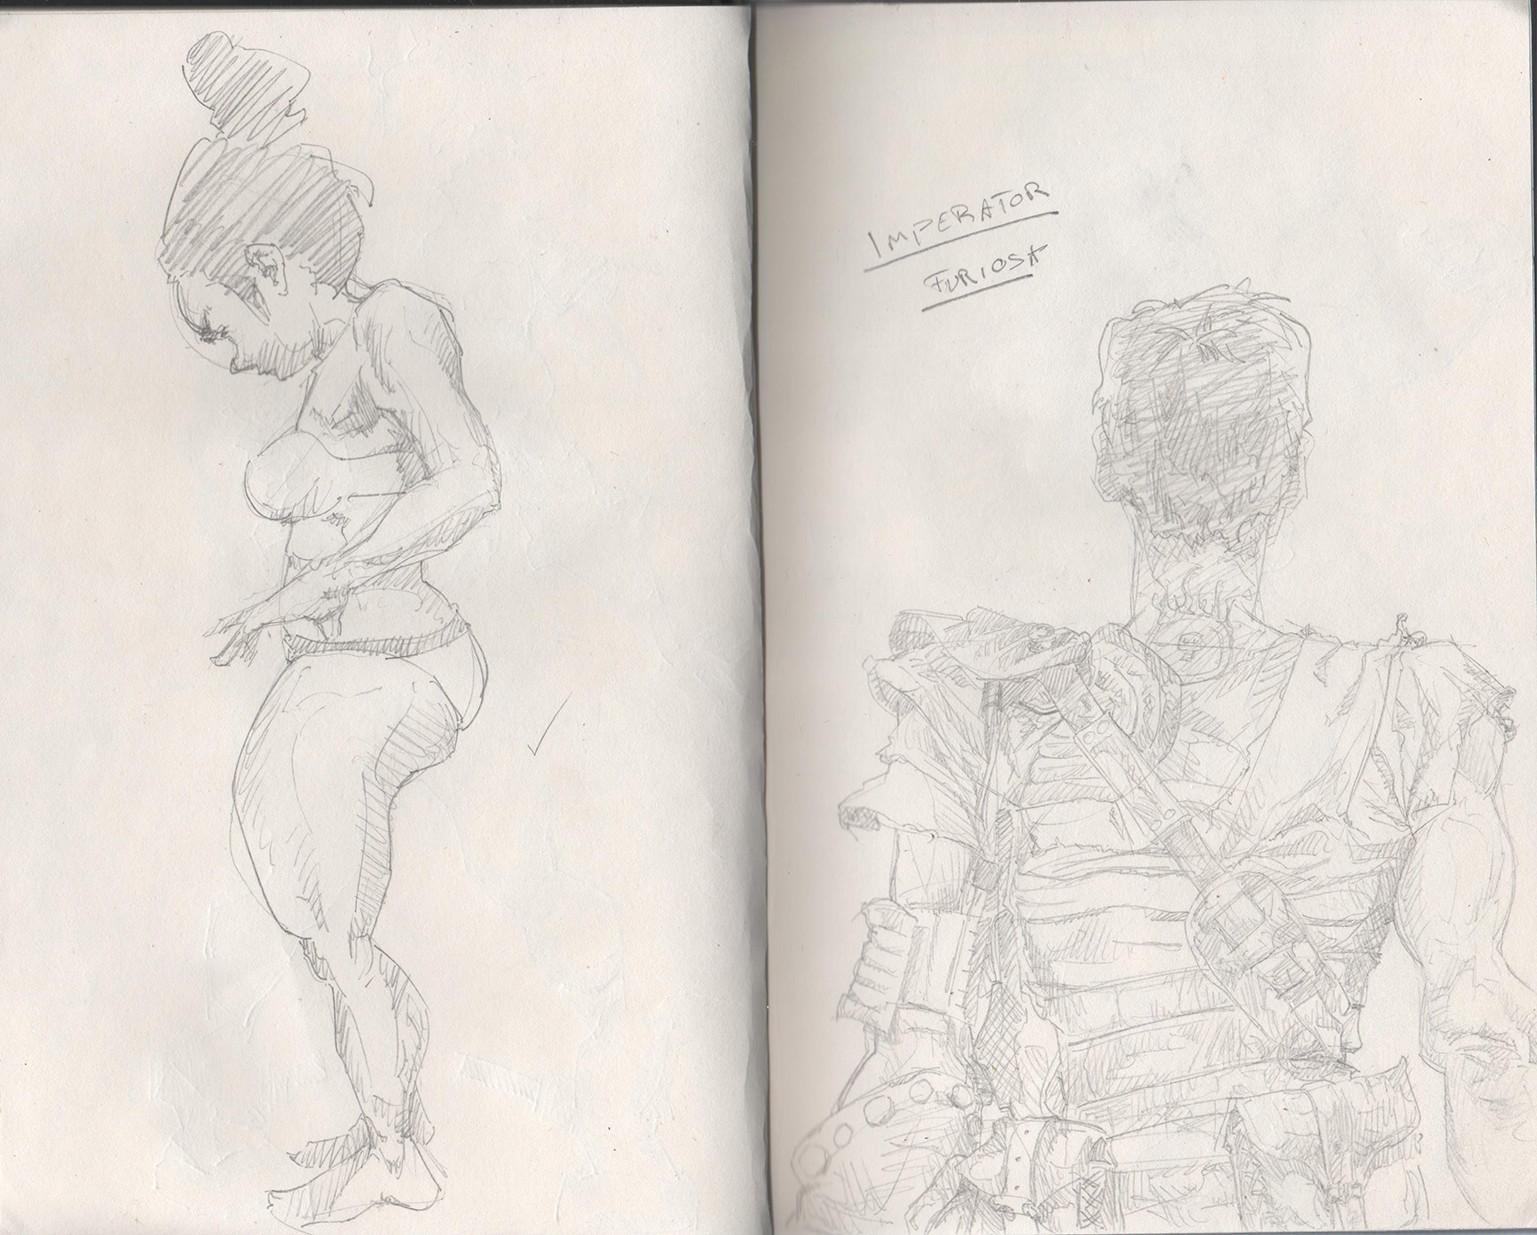 Tony gbeulie post sketch4